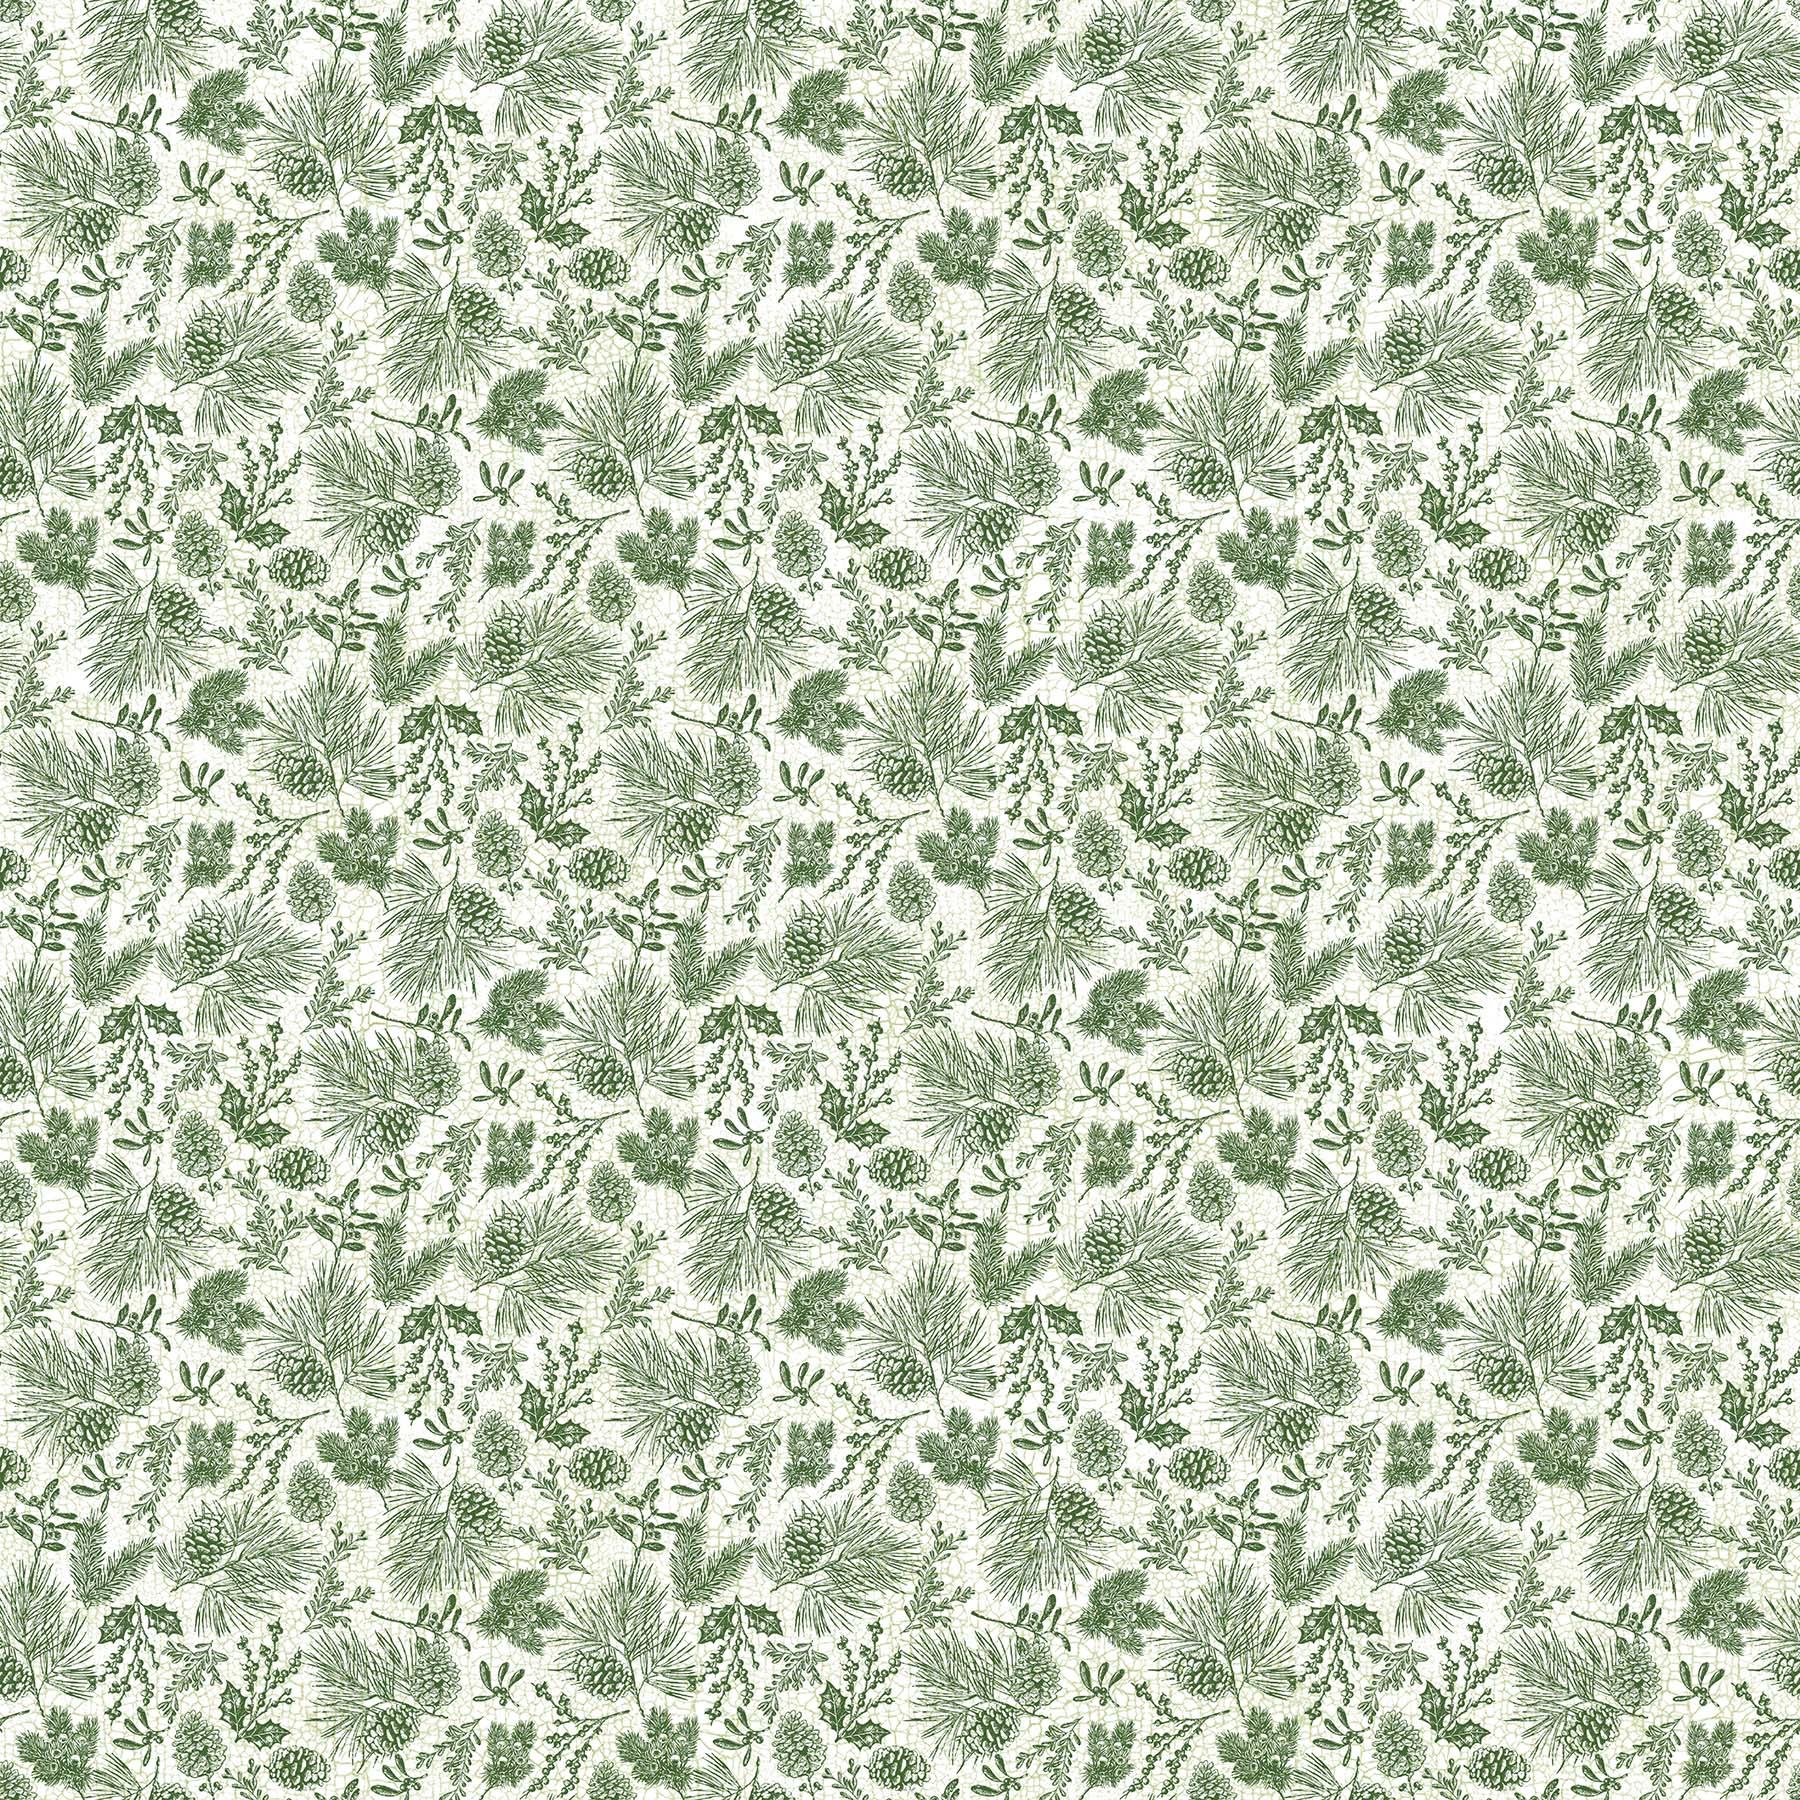 ALPINE WINTER GREEN 24342-72